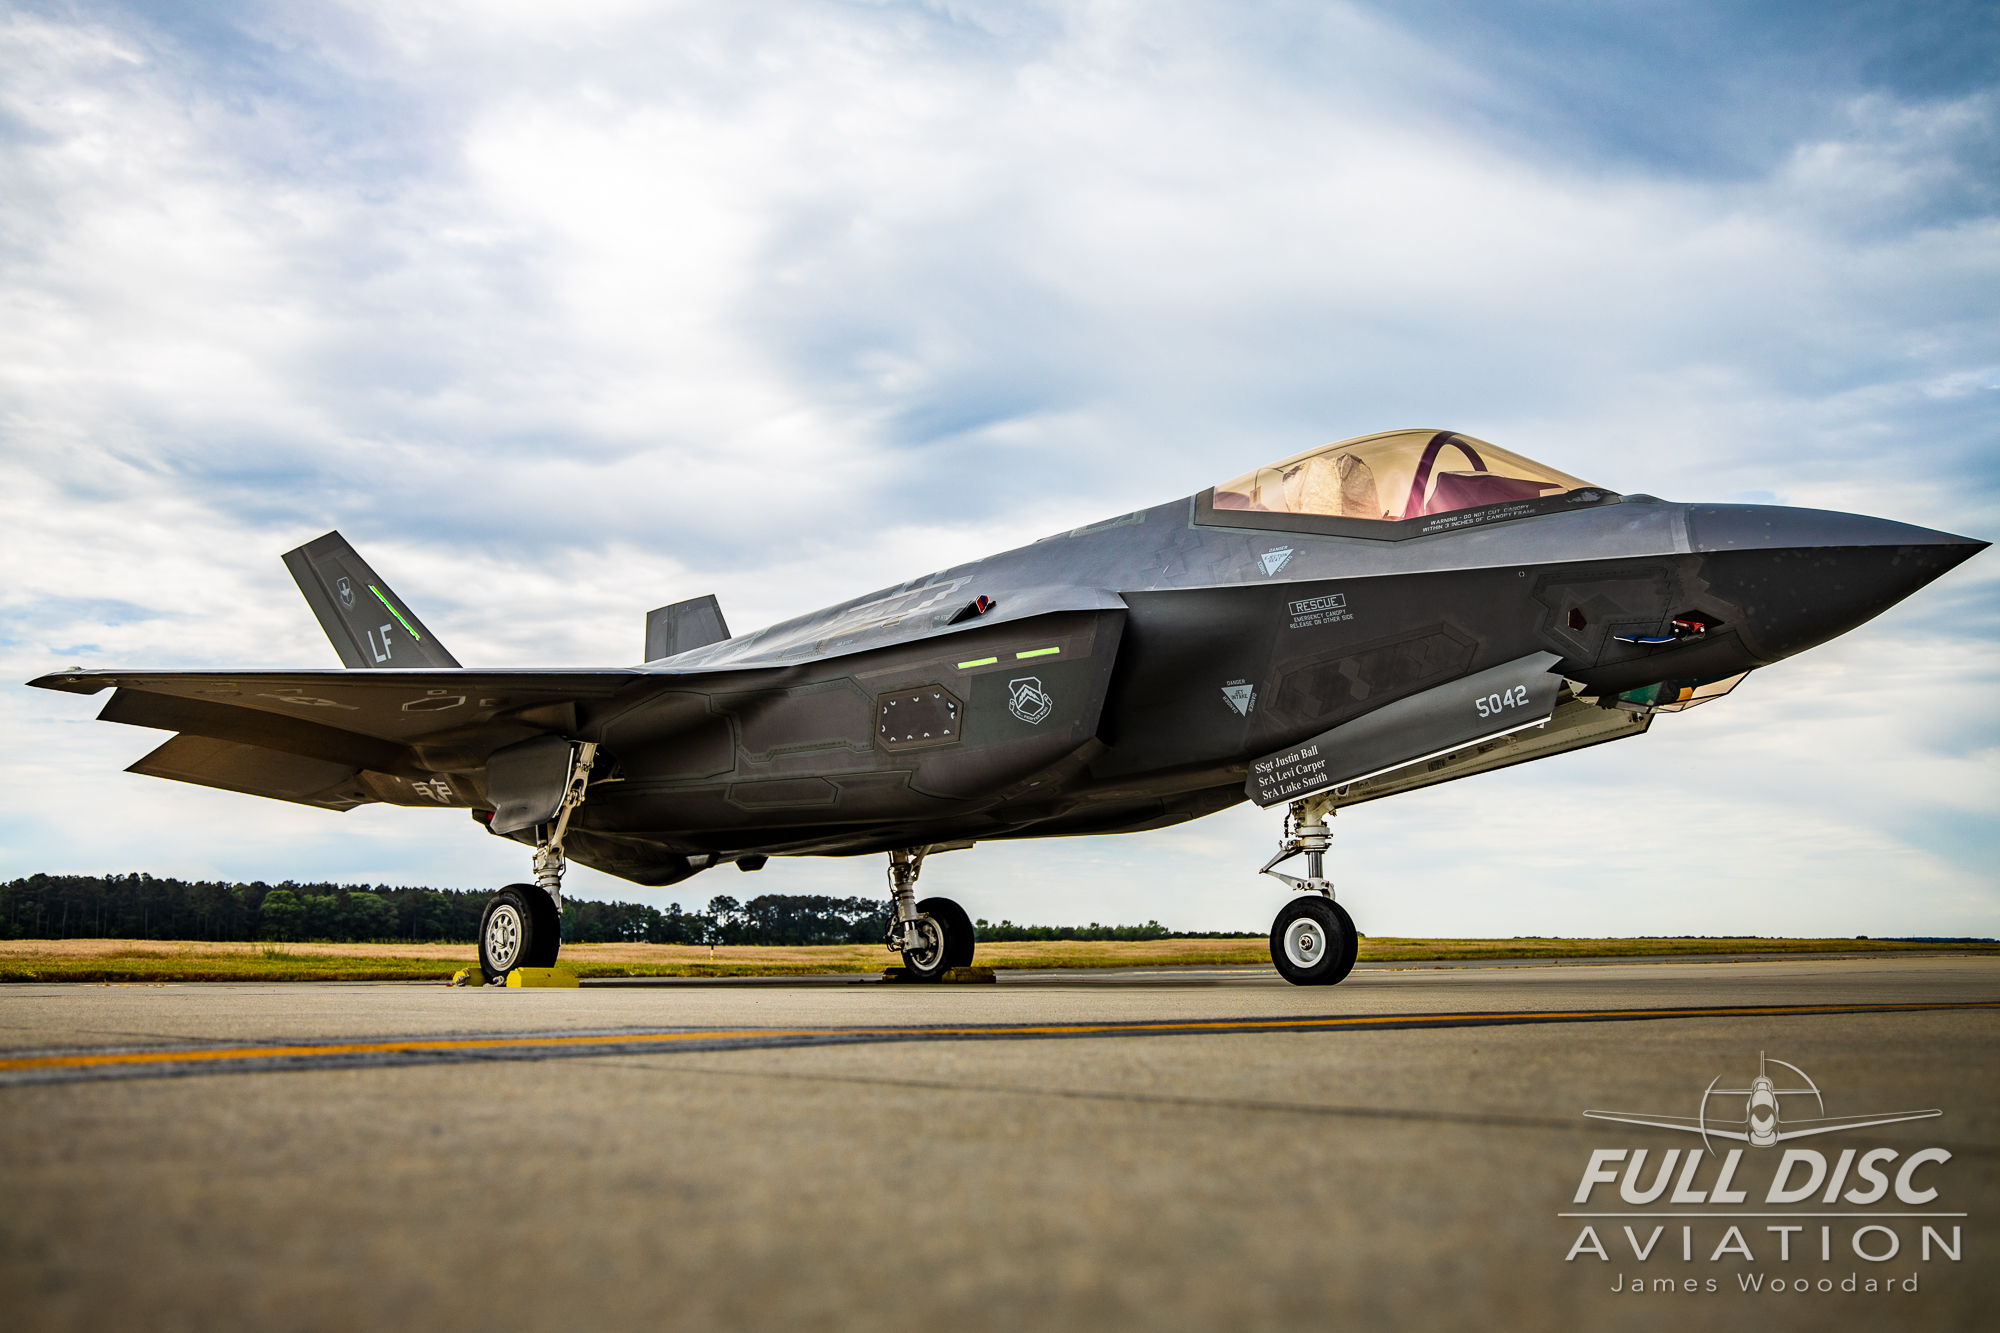 F35DemoTeam_FullDiscAviation_JamesWoodard-April 28, 2019-28.jpg